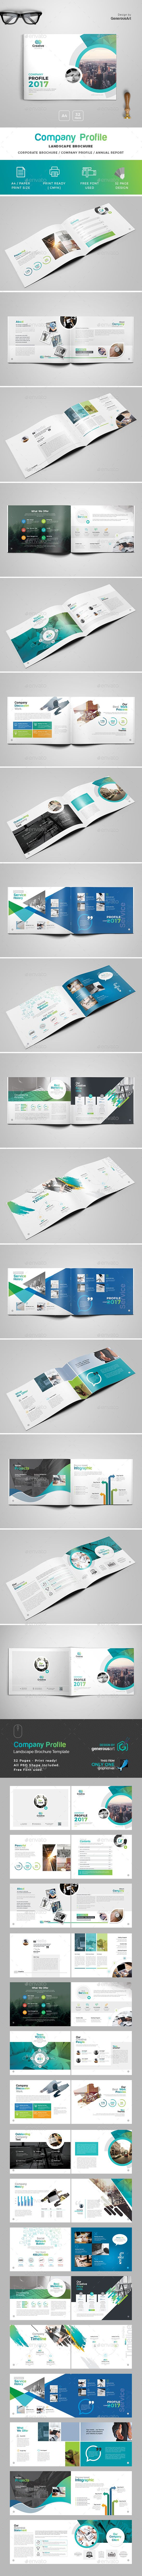 Company Profile Landscape Brochure — Photoshop PSD #multipurpose #company profile • Available here ➝ https://graphicriver.net/item/company-profile-landscape-brochure/20544988?ref=pxcr